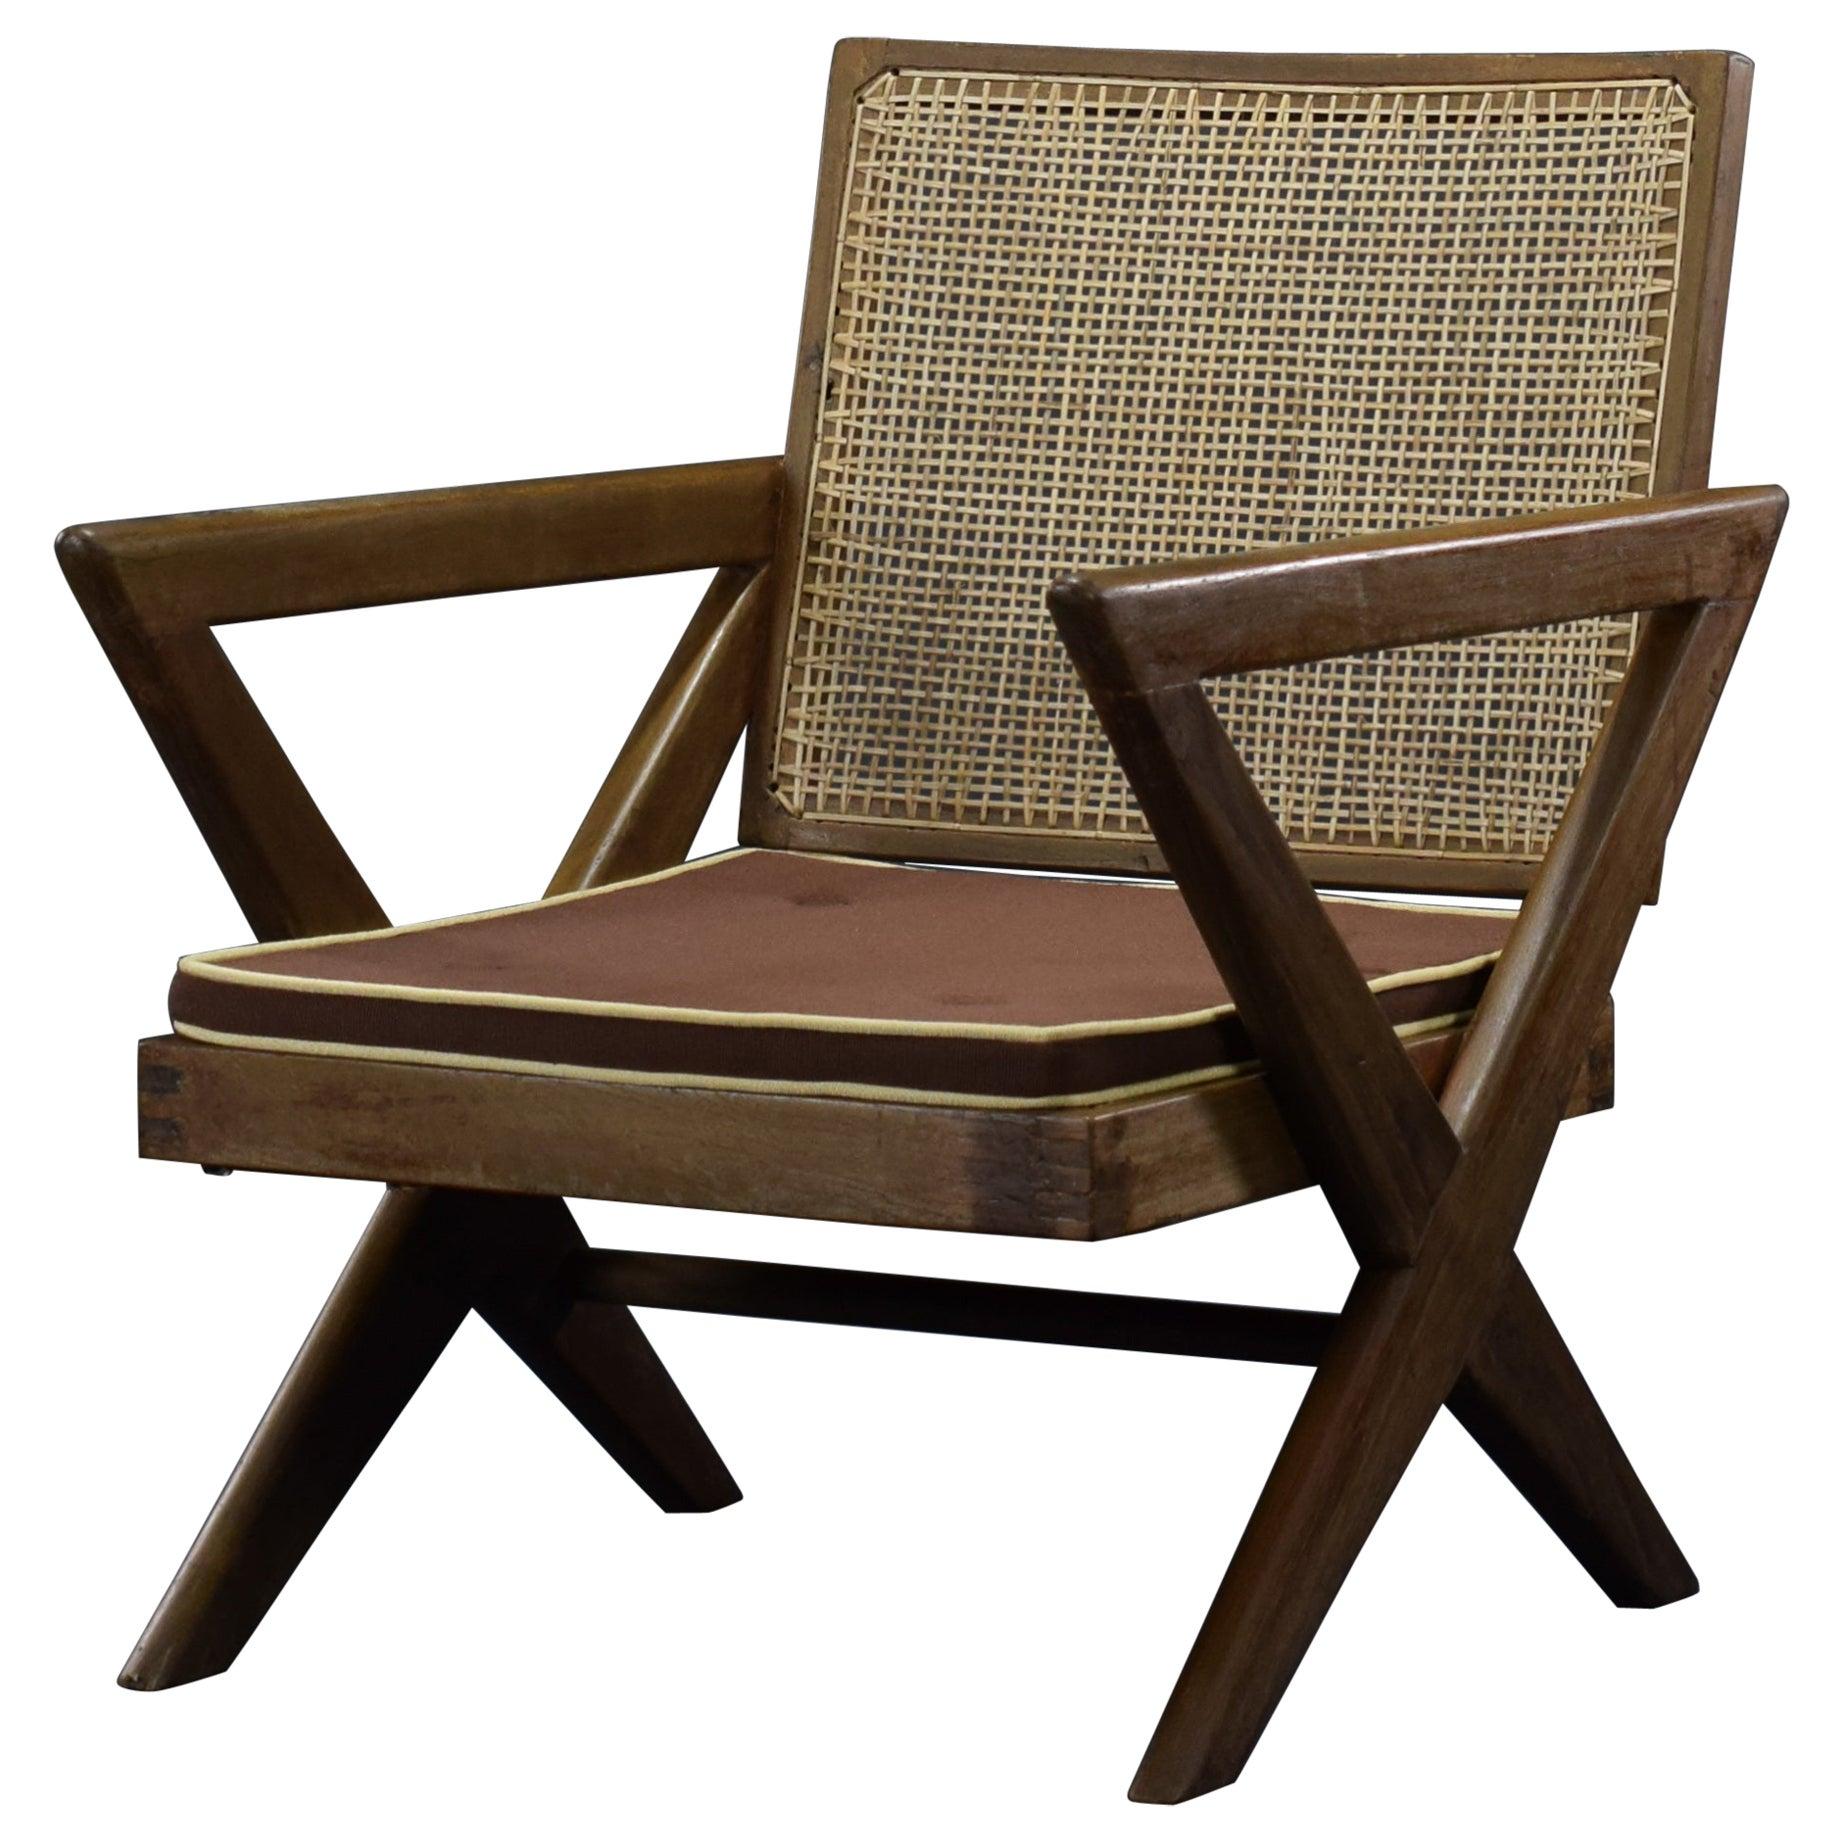 Pierre Jeanneret X-Easy Armchair Authentic Mid-Century Modern Chandigarh